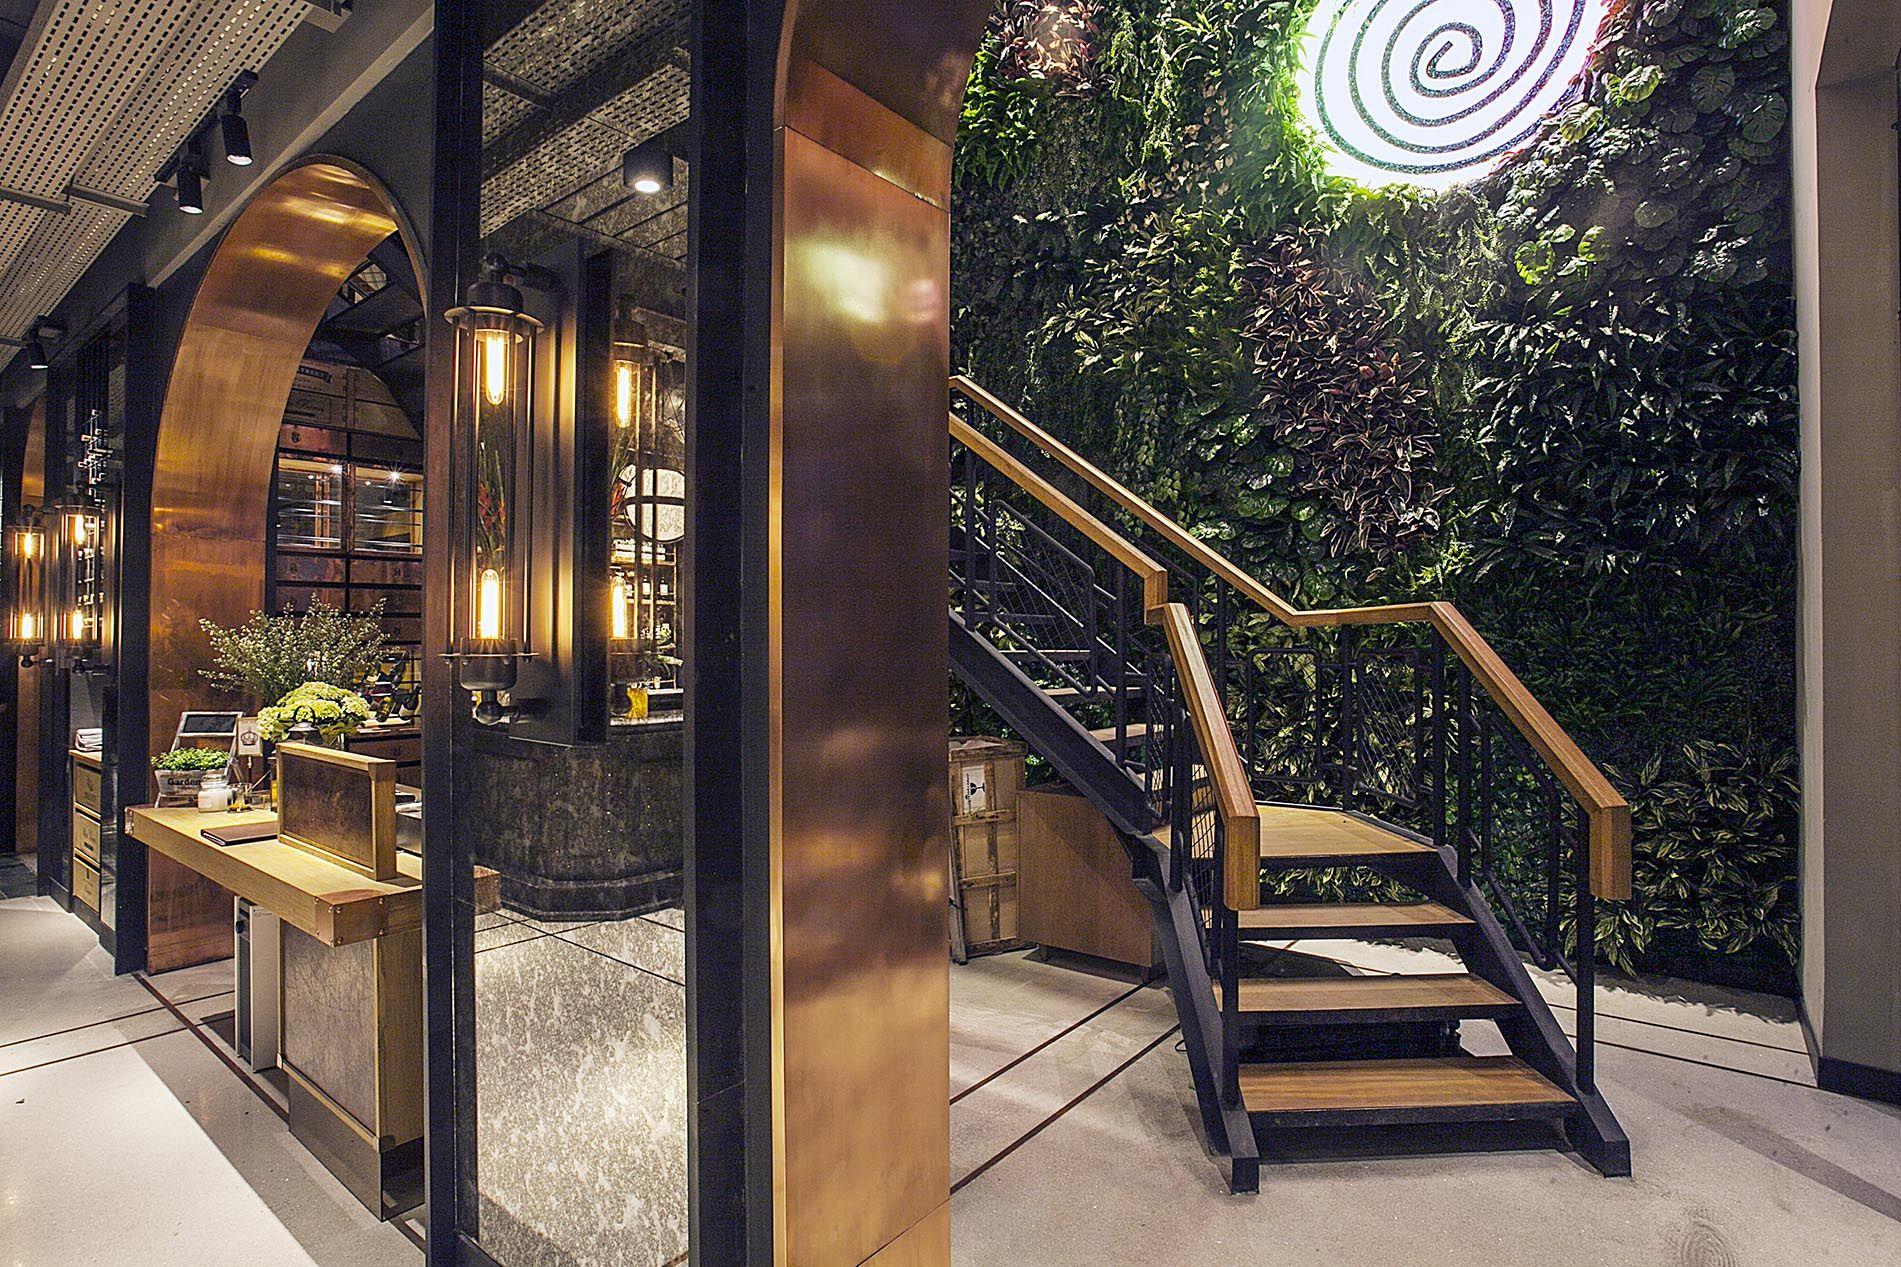 Hurricane S Grill At Gunawarman Jakarta Bar Restaurant Interior Bar Design Restaurant Grill Restaurant